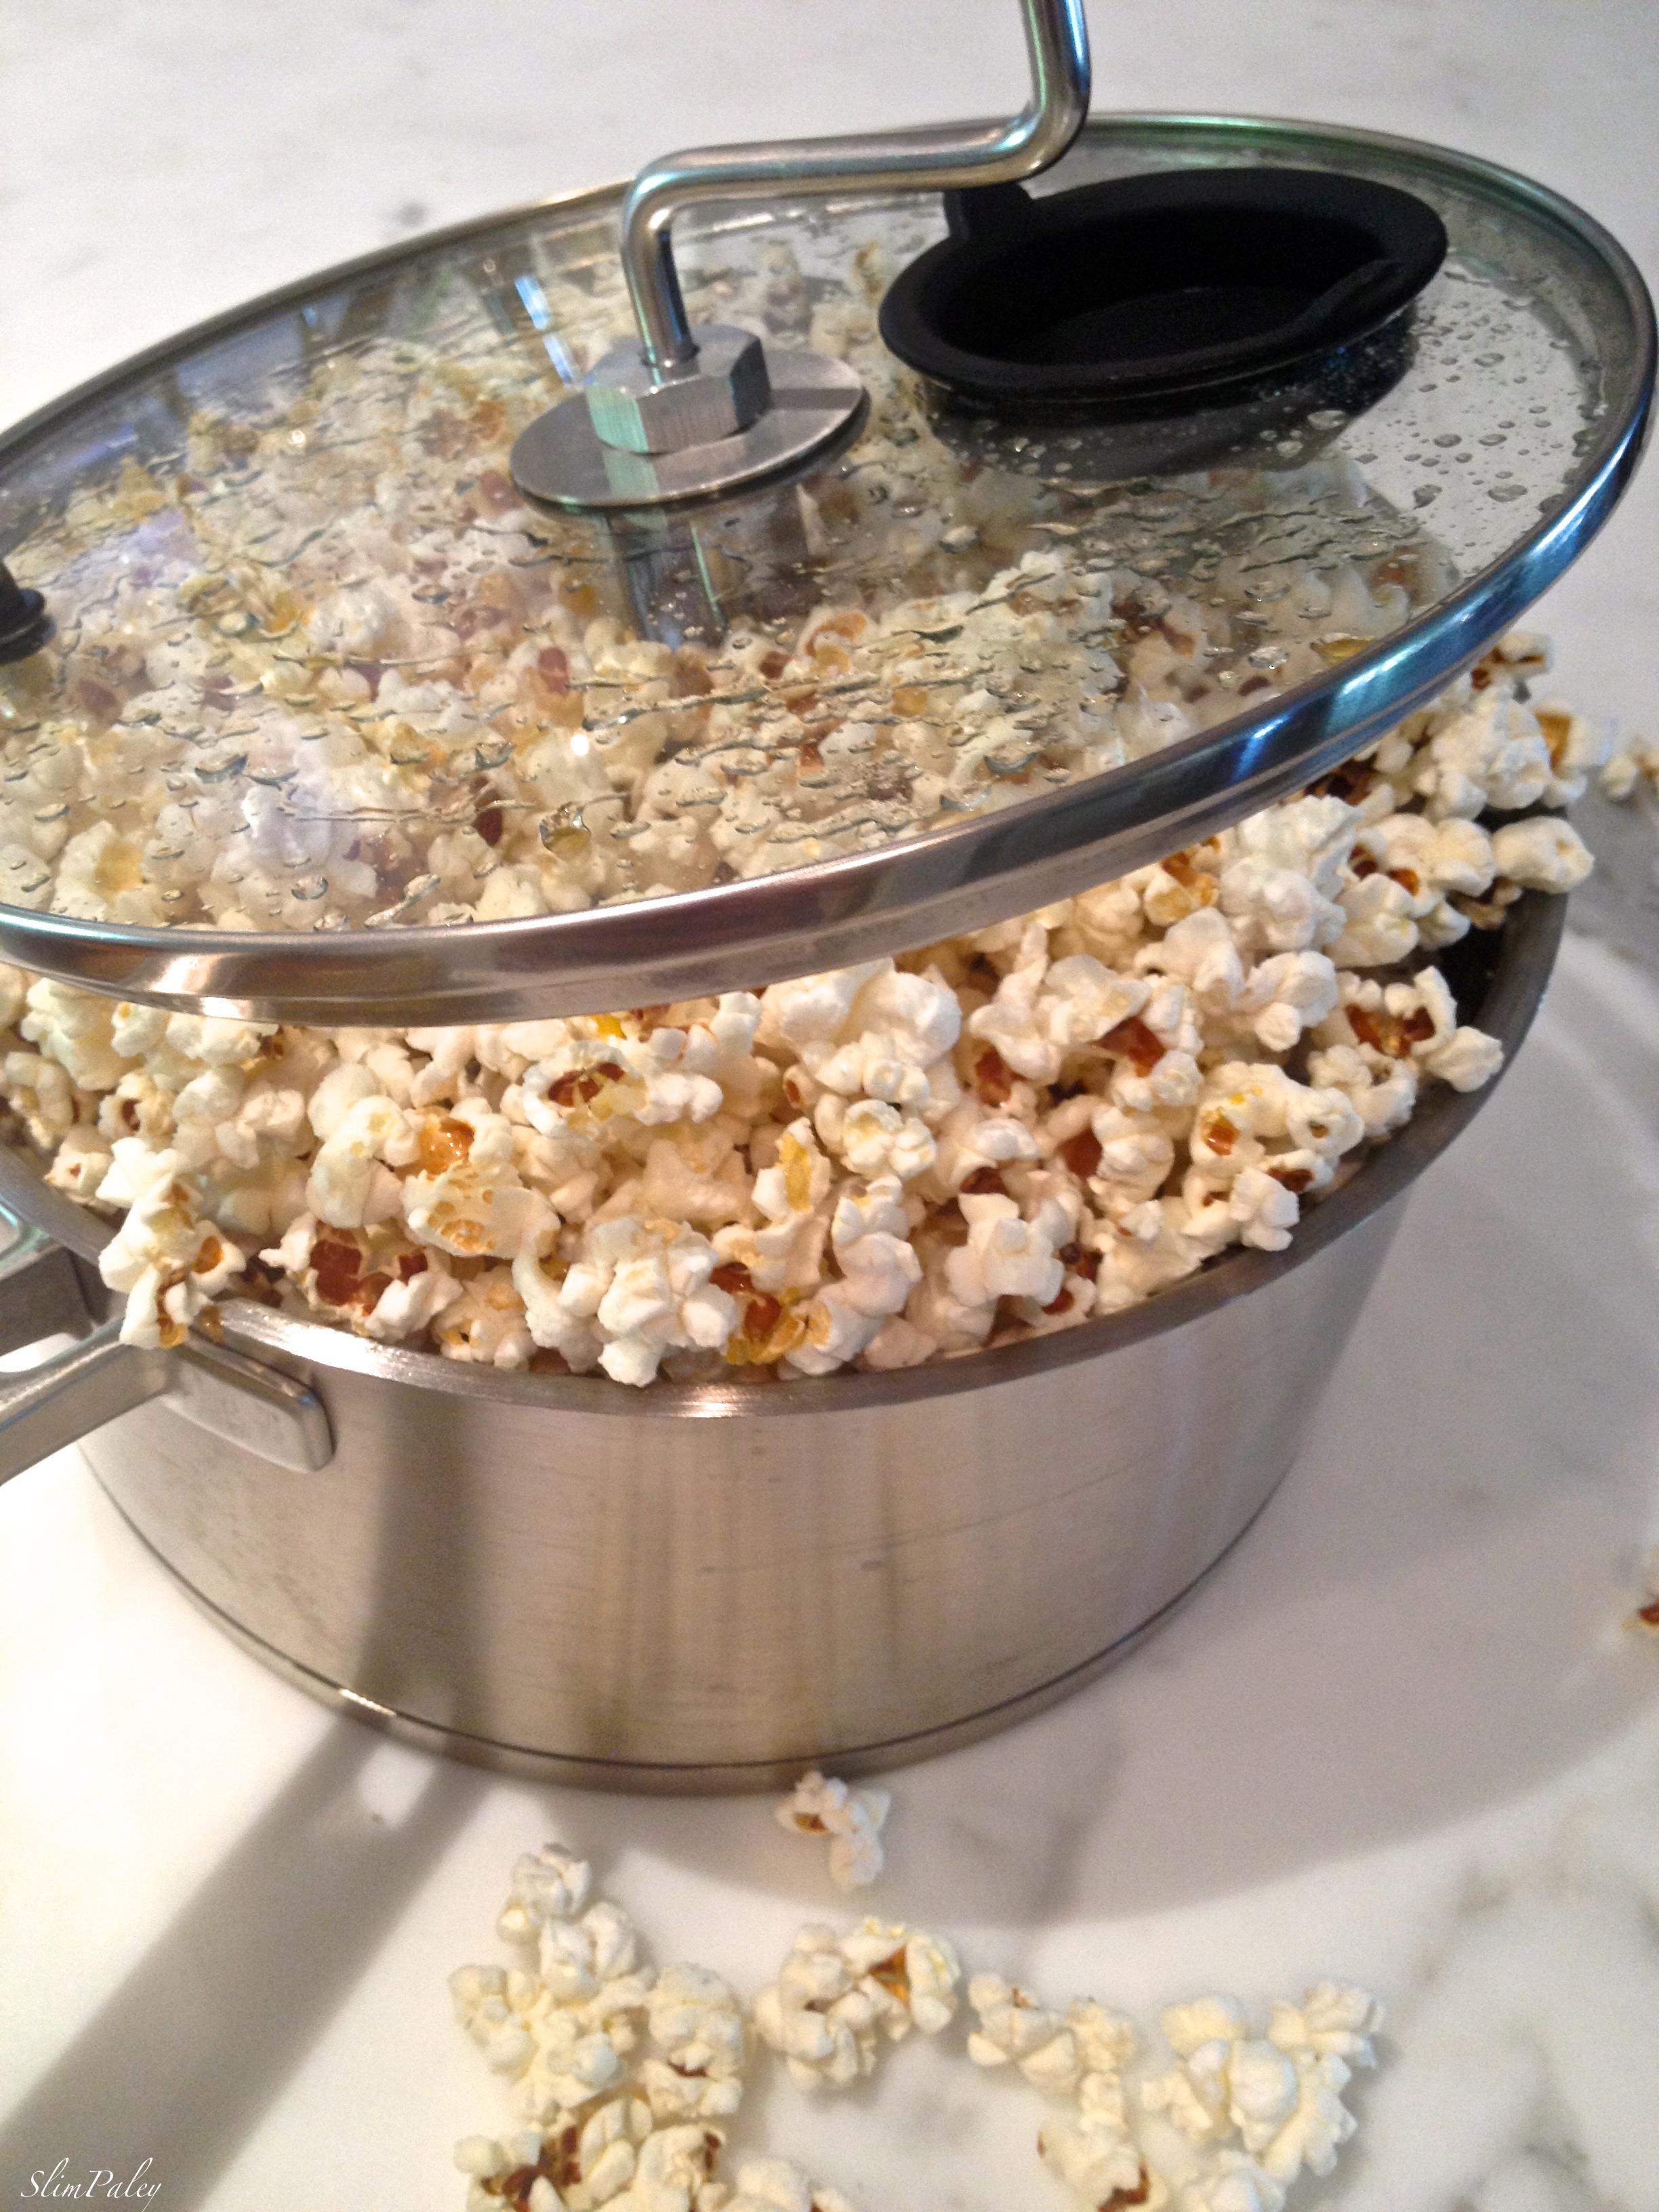 stove top popcorn maker